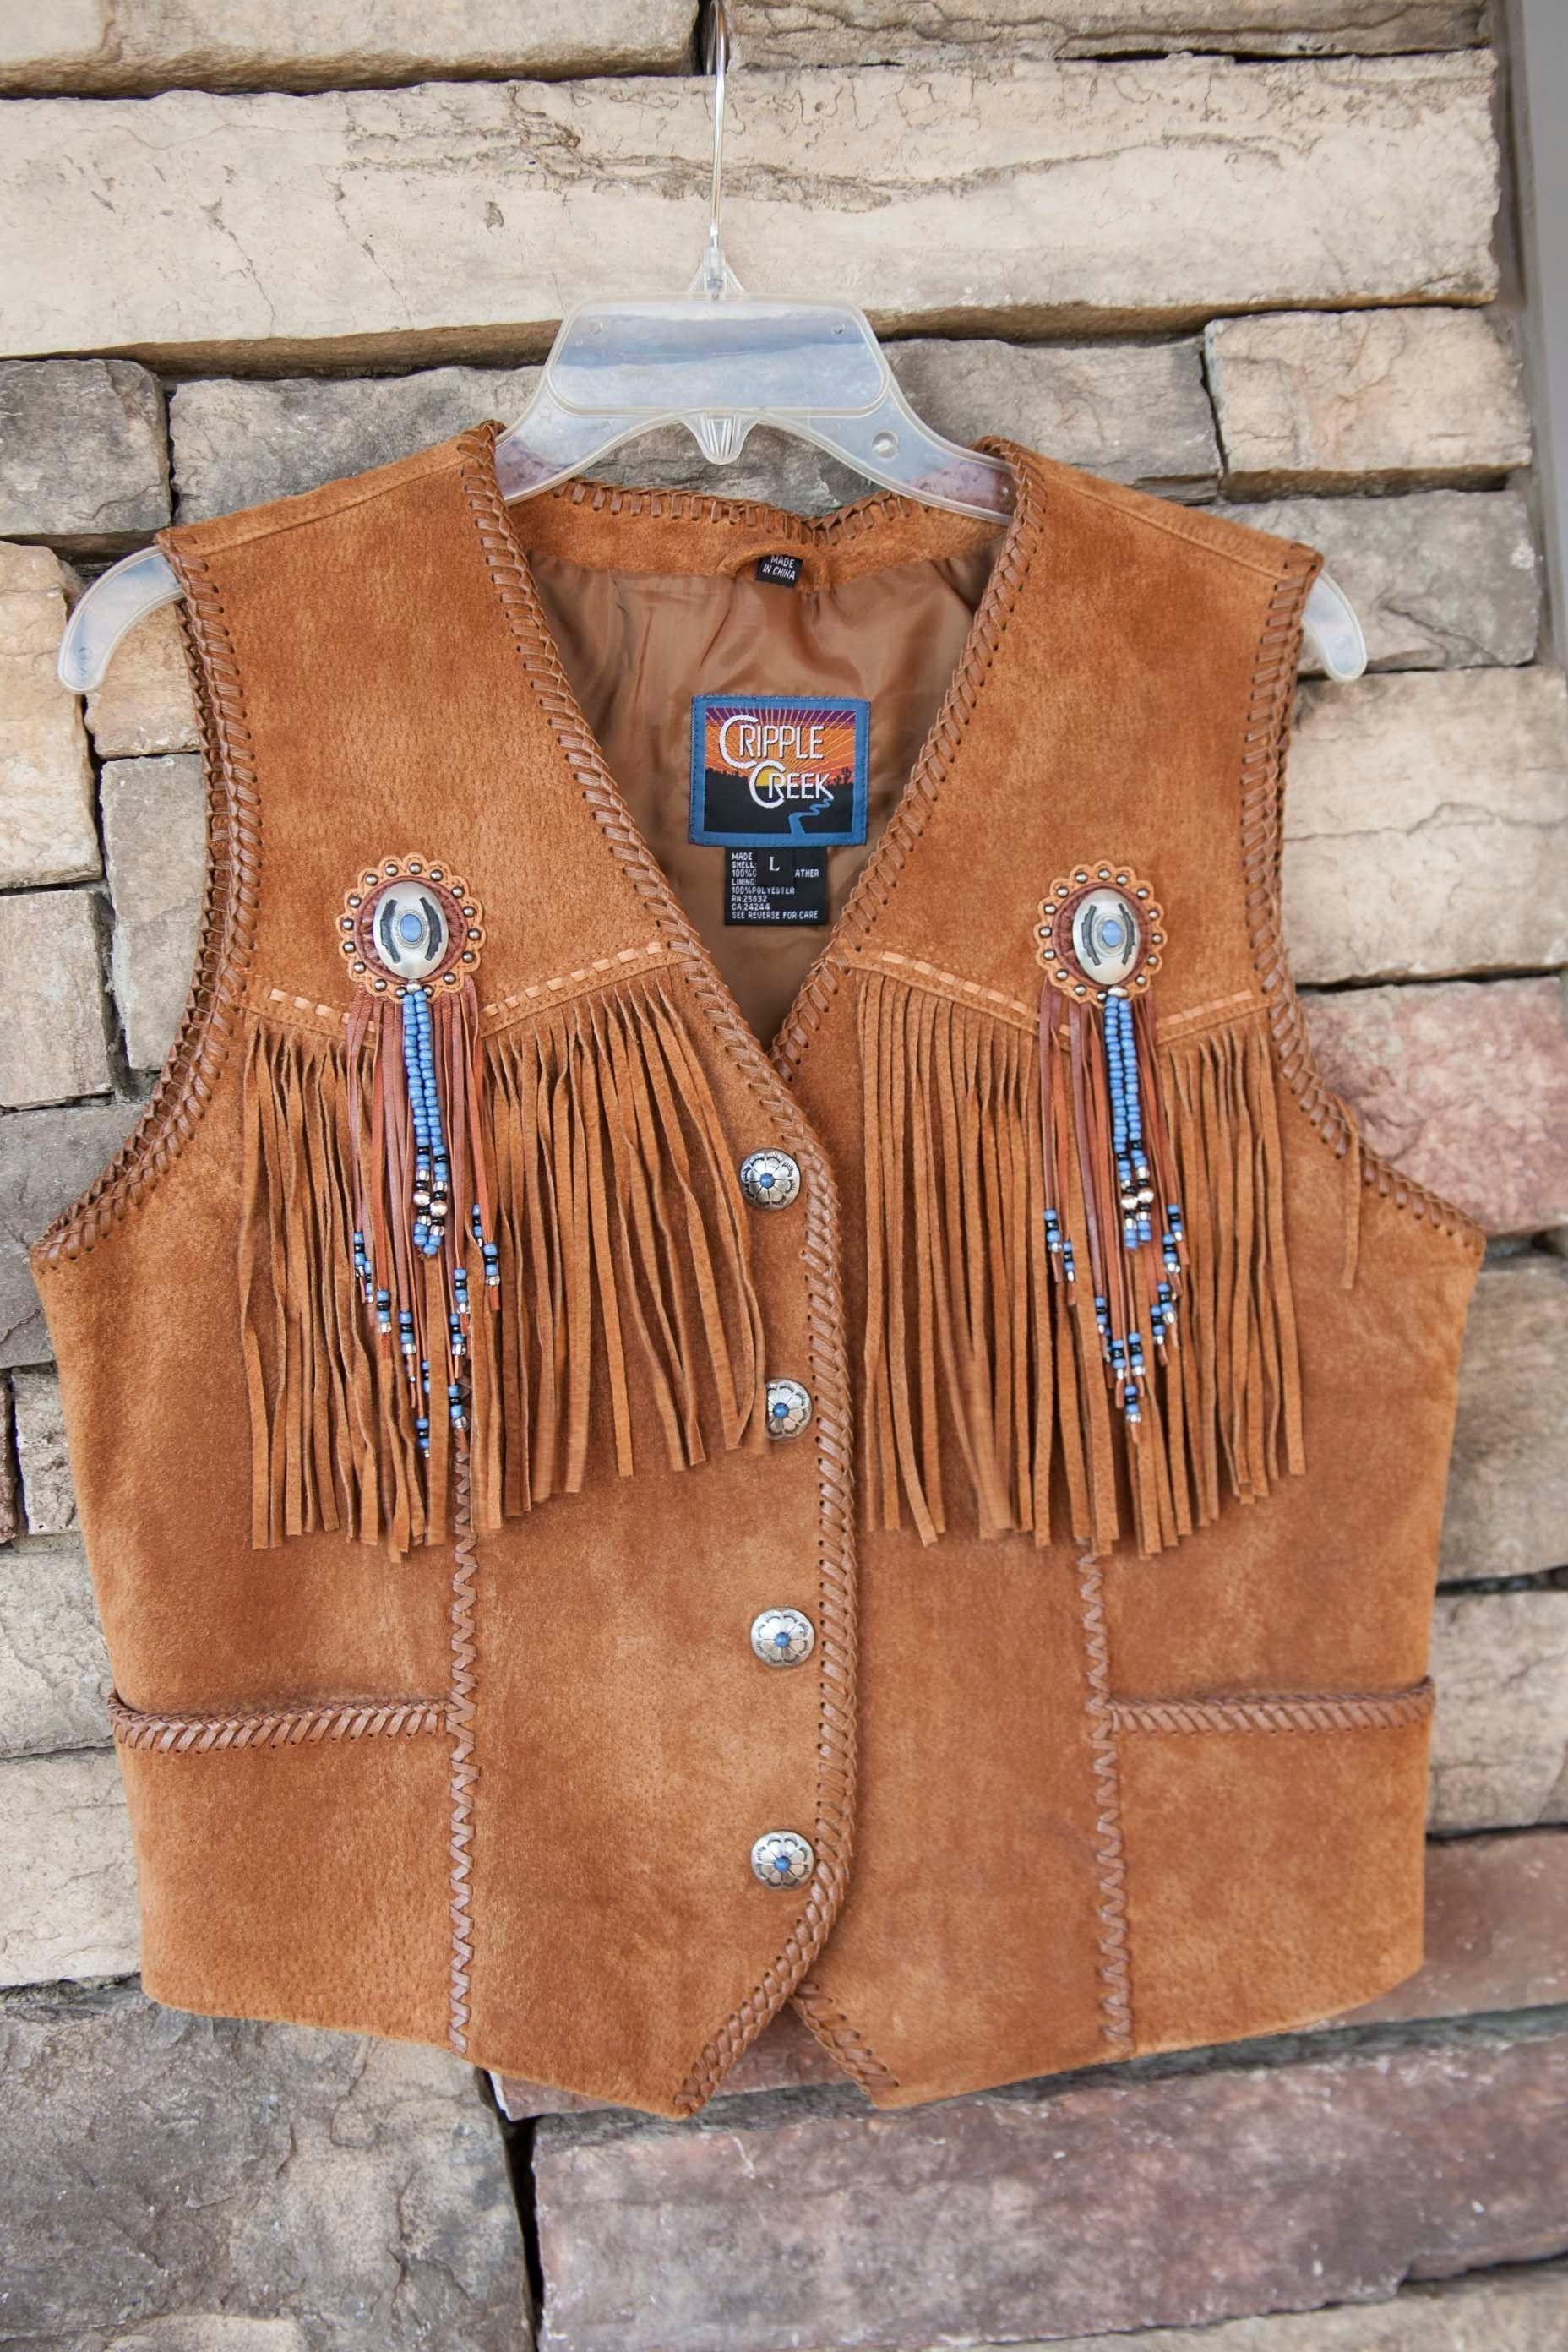 Cripple Creek Leather Beaded Fringe Vest Fringe Leather Jacket Vest Outfits For Women Western Leather [ 2784 x 1856 Pixel ]